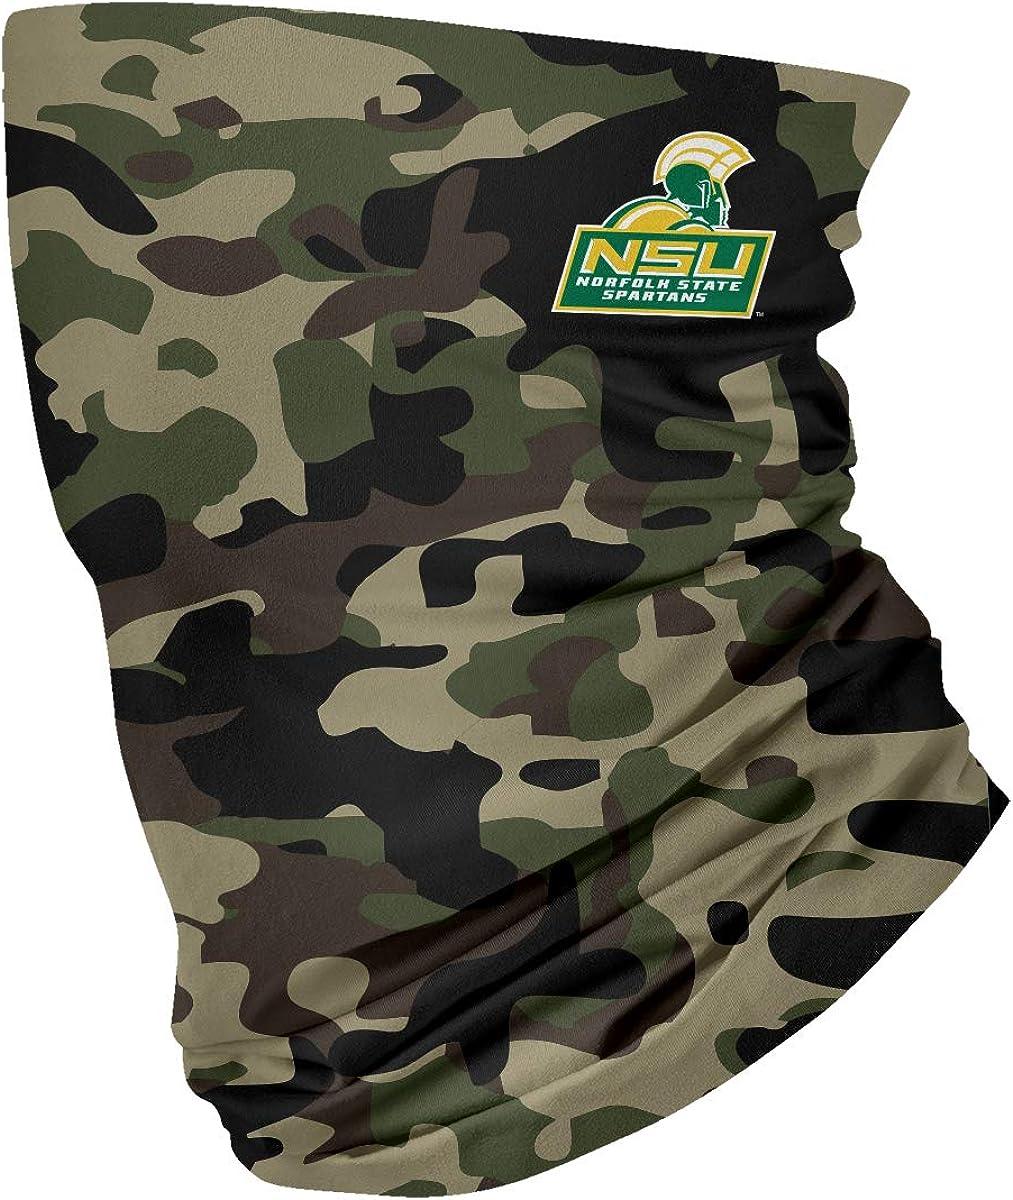 Norfolk State Spartans Green Neck Gaiter Camo print Vive La Fete